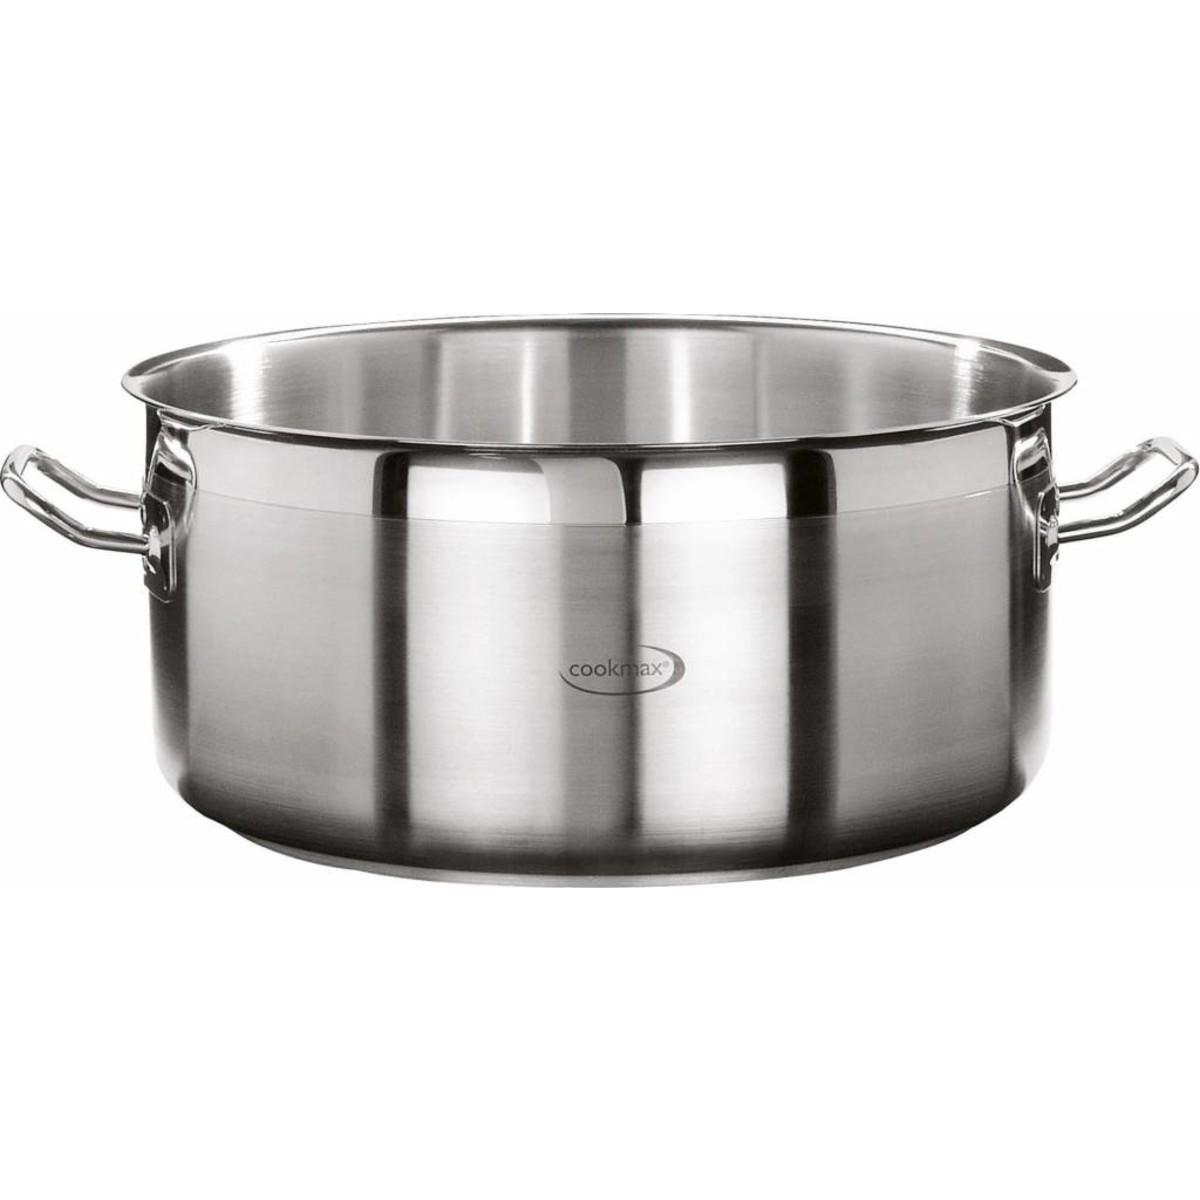 "Bratentopf flach ""Cookmax Professional"" Ø 20 cm, H: 9 cm. Inhalt 2,8L"